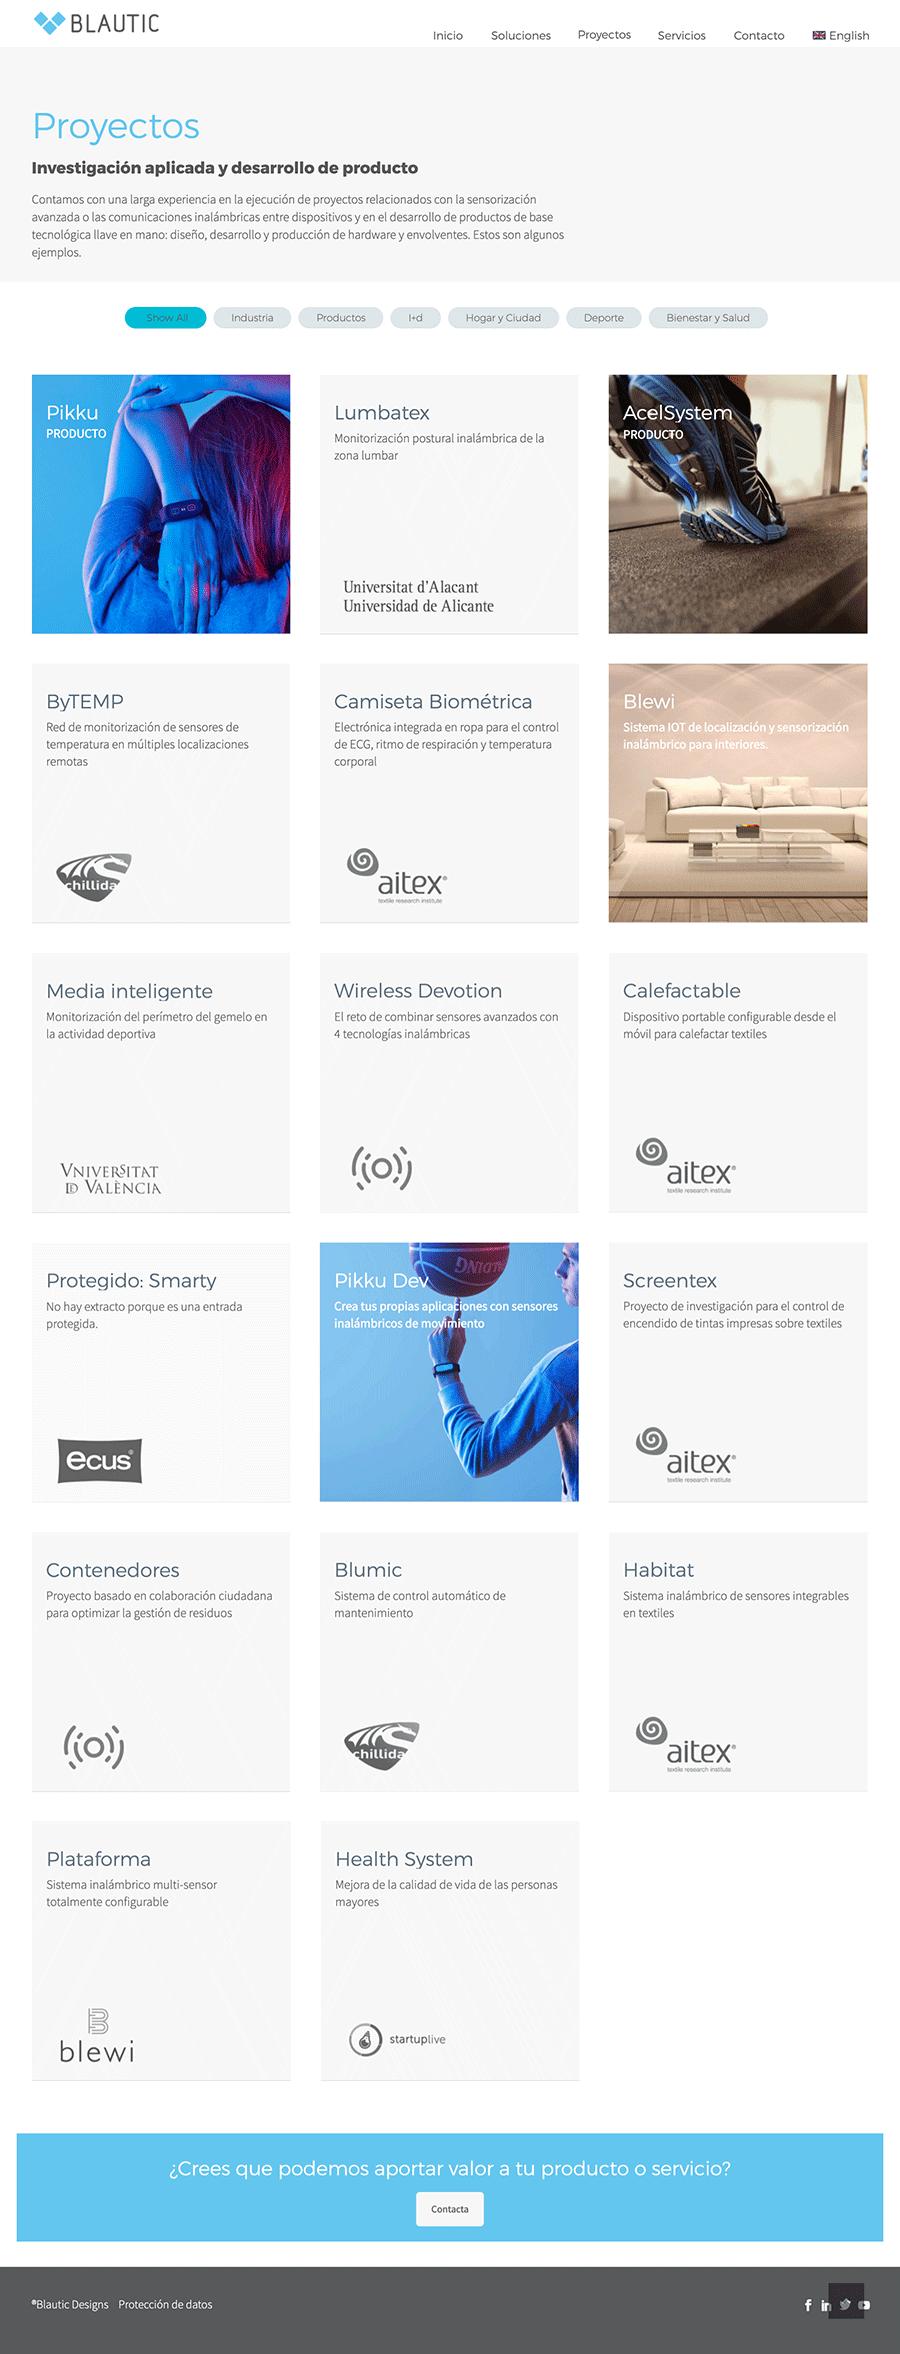 Sr Beardman Diseño Web Concurso Diseño Cetem